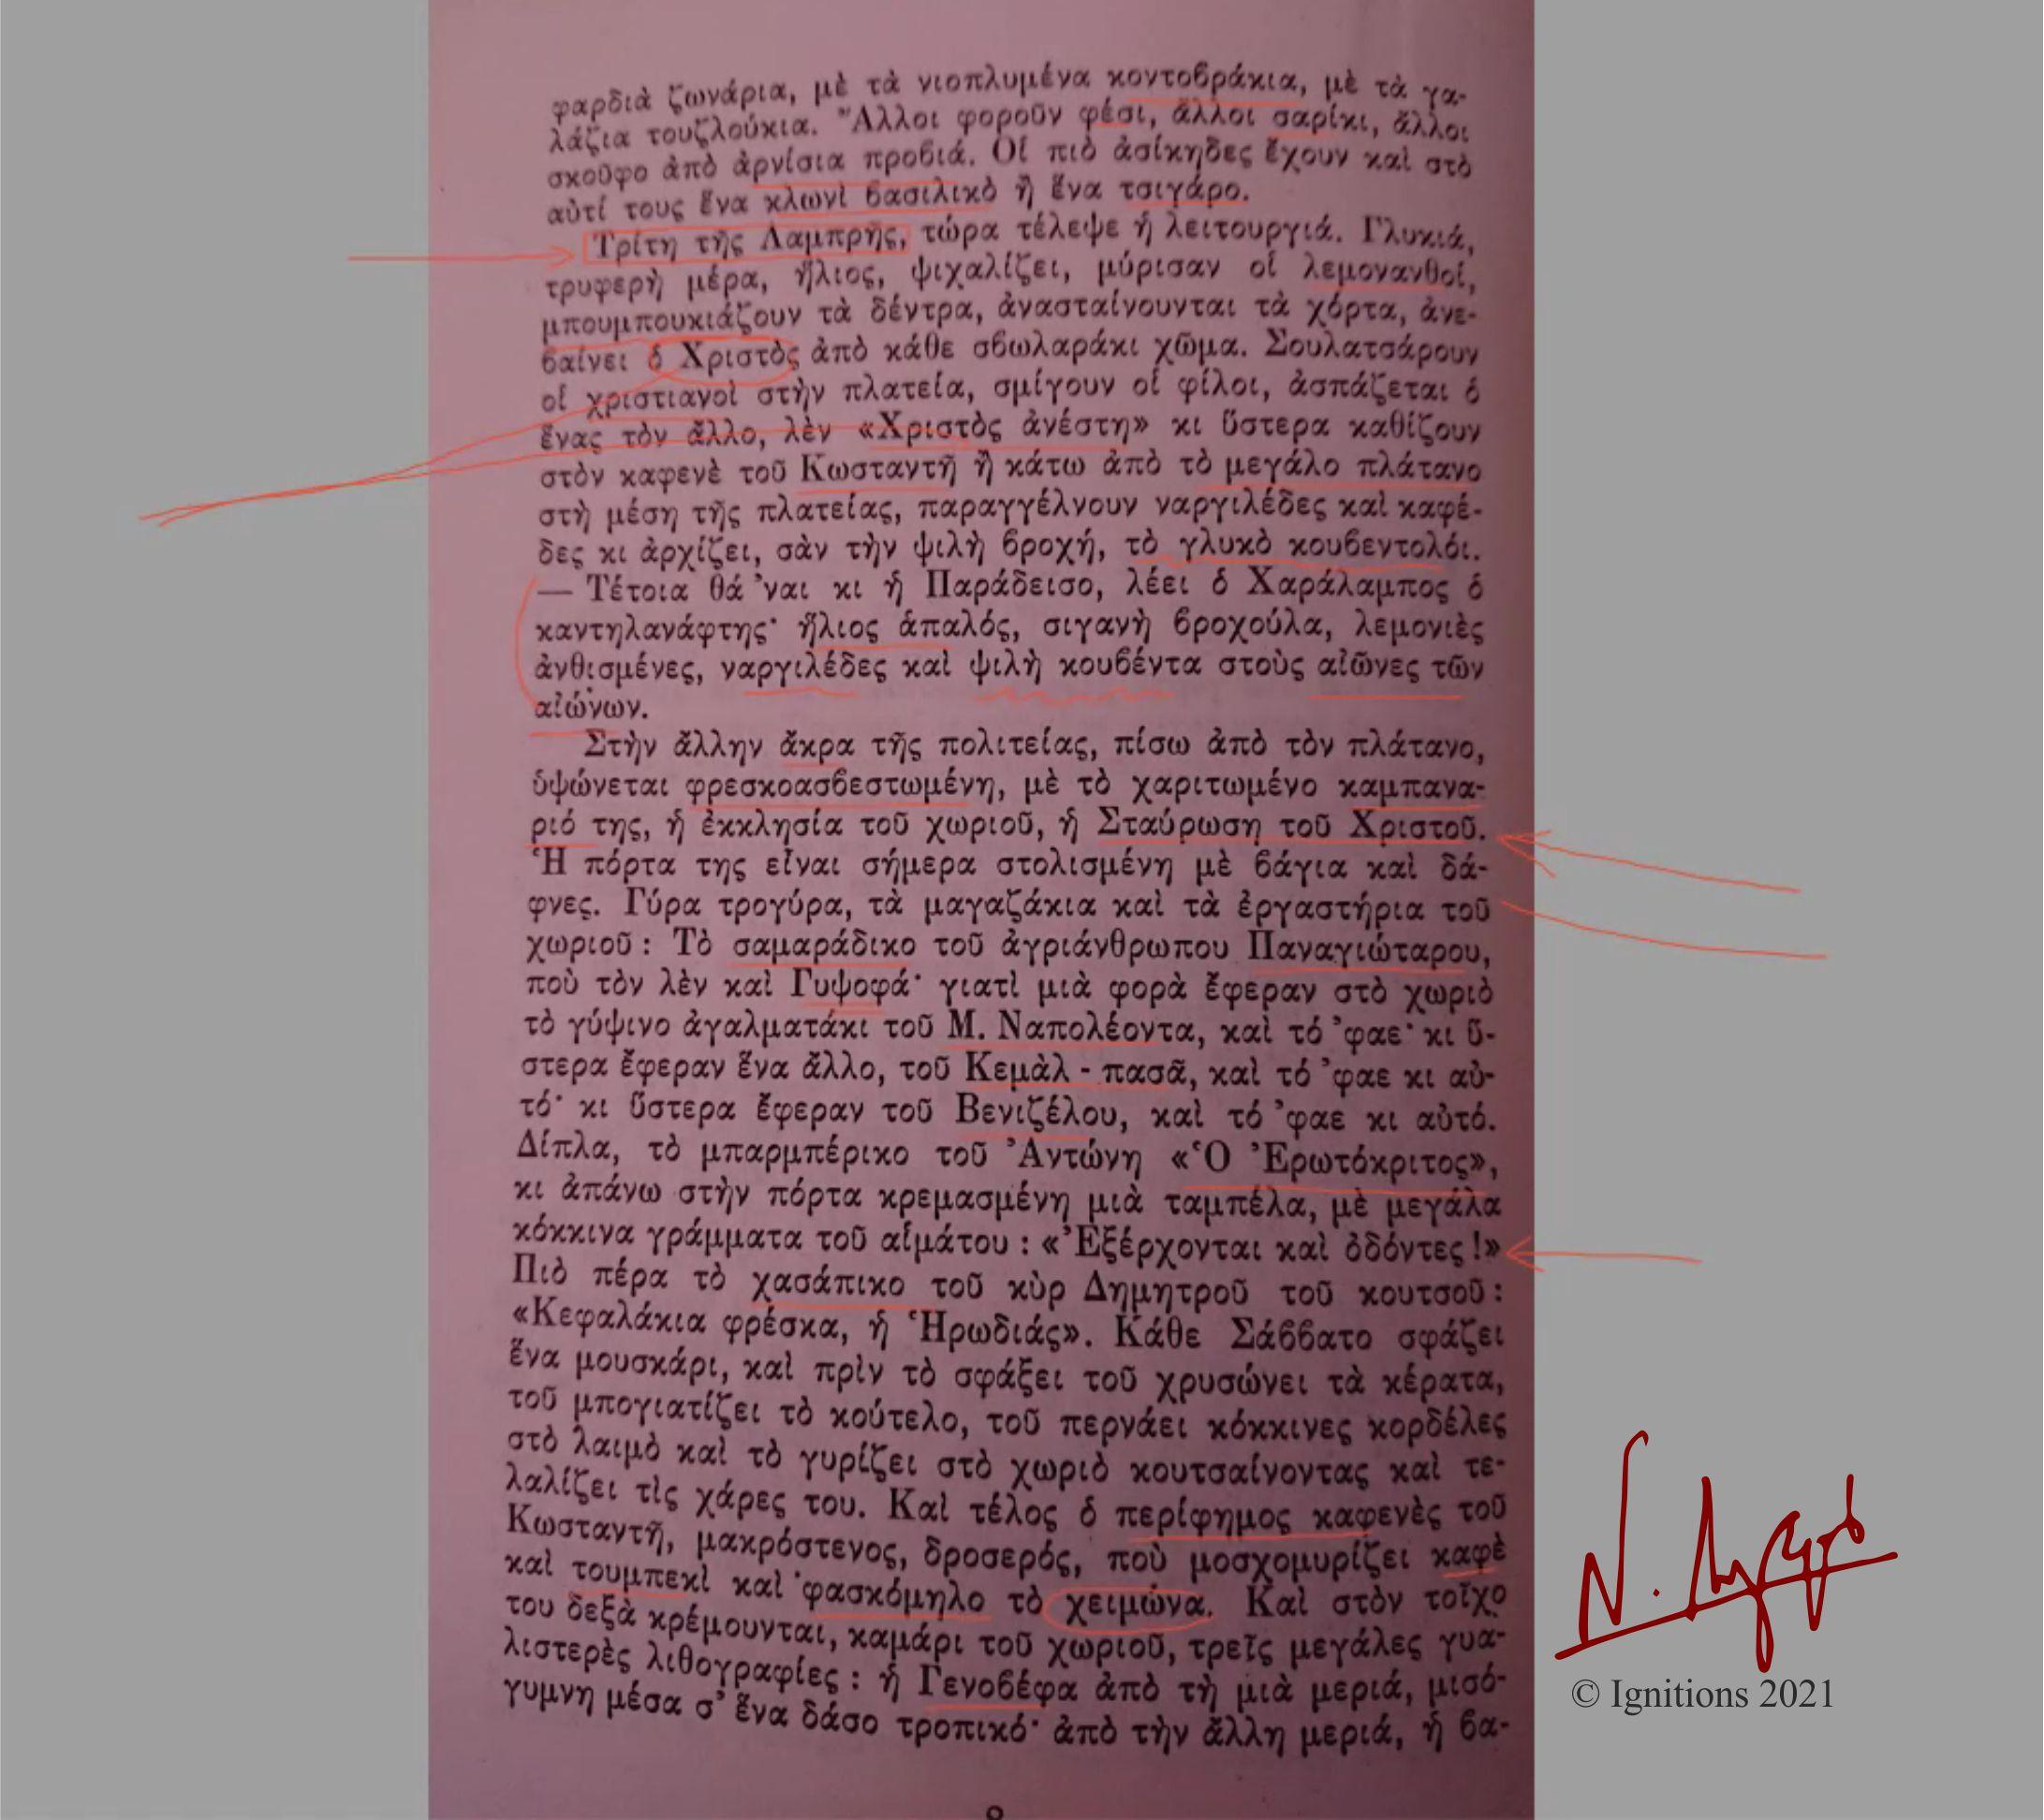 60103 - III - Η συνέχεια της Σταύρωσης του Χριστού. Συνέχεια IX. (Dessin)